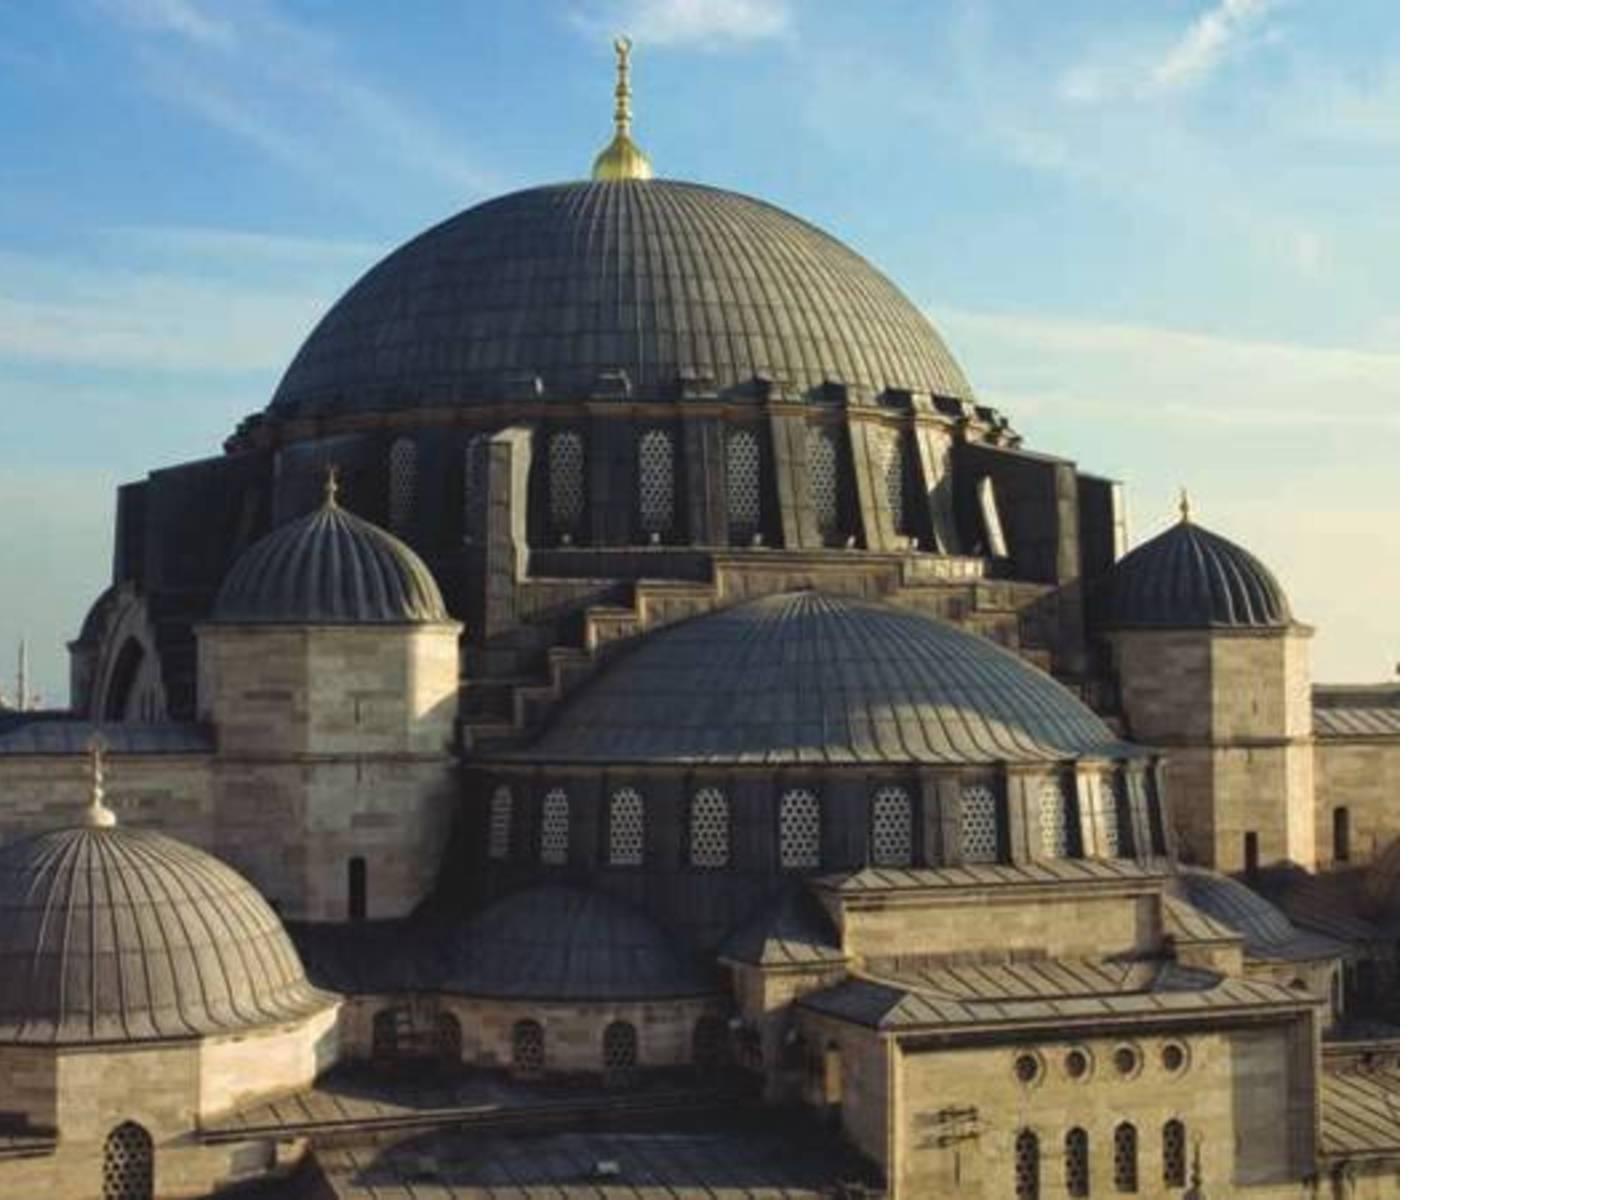 Mimar Sinan The Architect - ROME